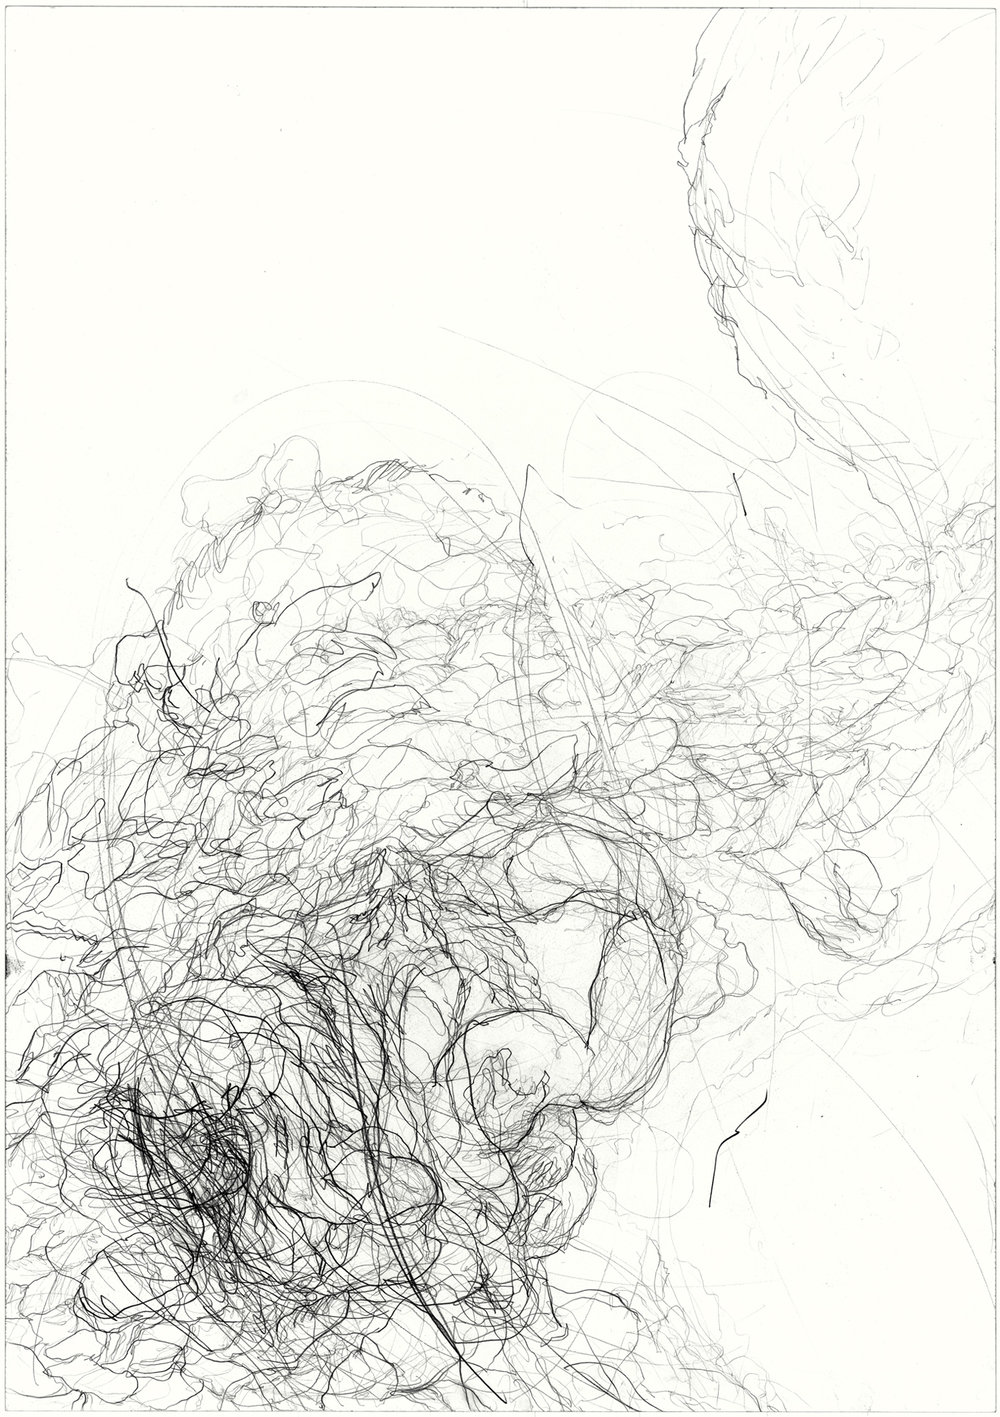 Undercurrent  2011, pencil on paper, 84.1 cm x 59.5 cm.